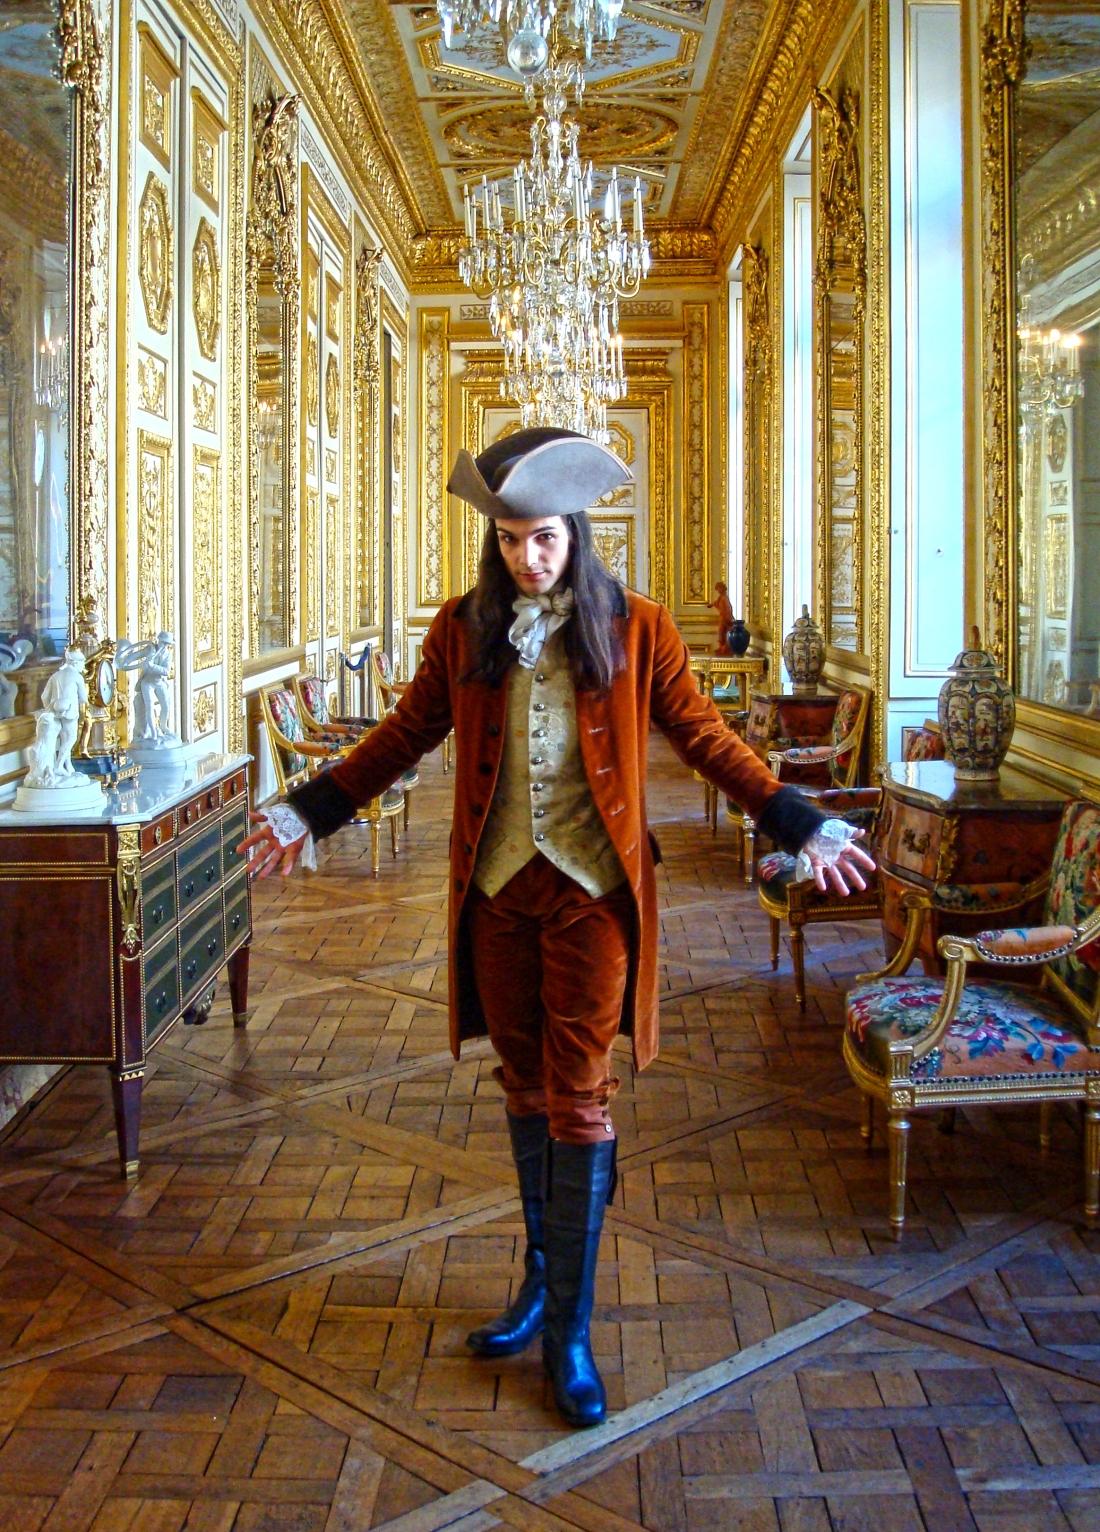 hotel-de-la-marine_place_concorde_tournage_historique_diamant_de_la_victoire_telombre